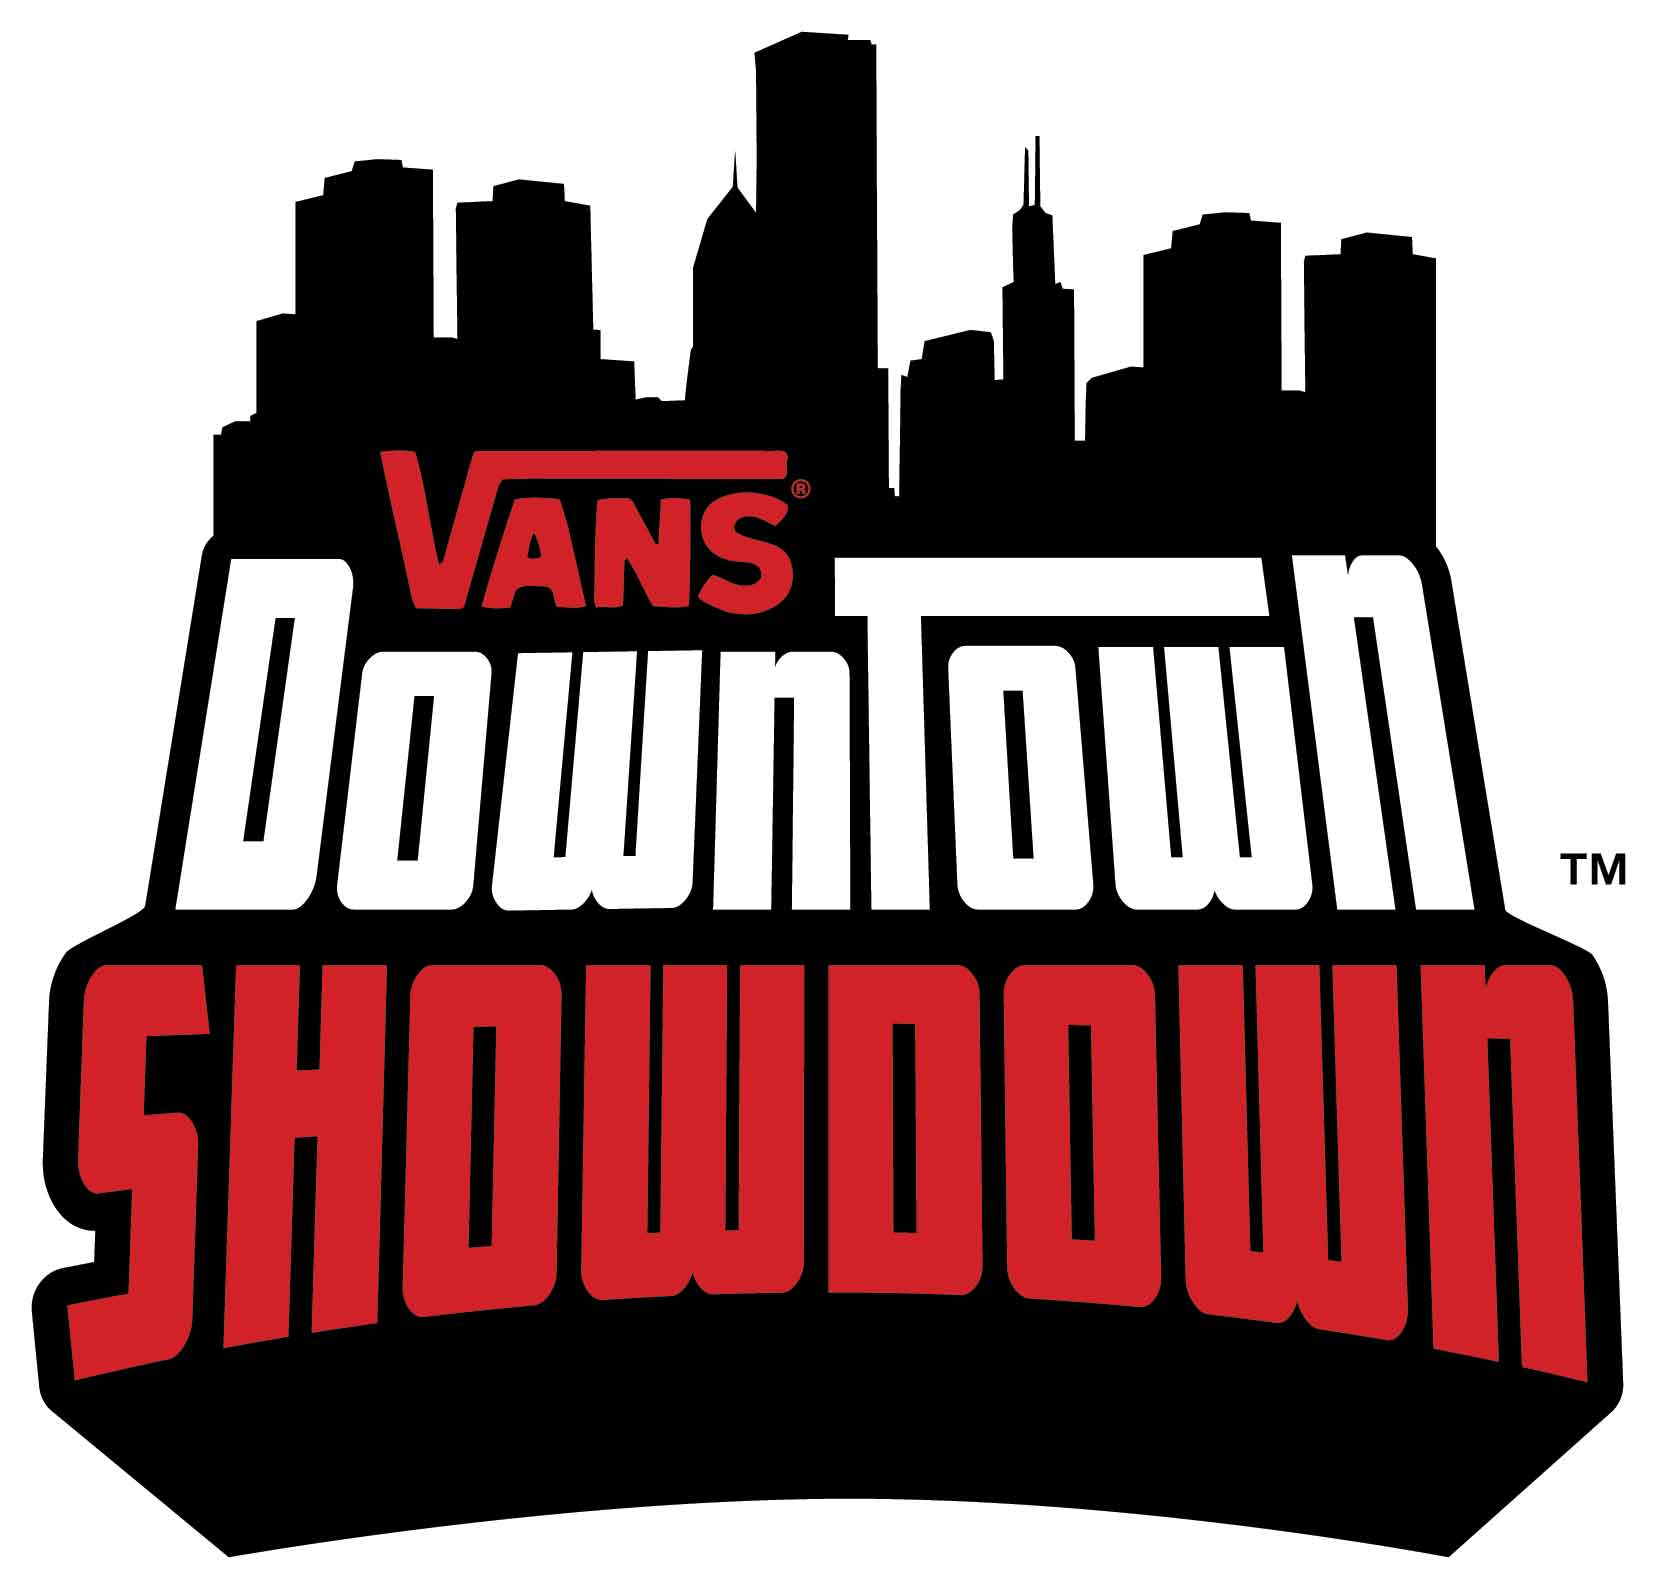 1655x1589 2008 Vans Downtown Showdown Transworld Skateboarding